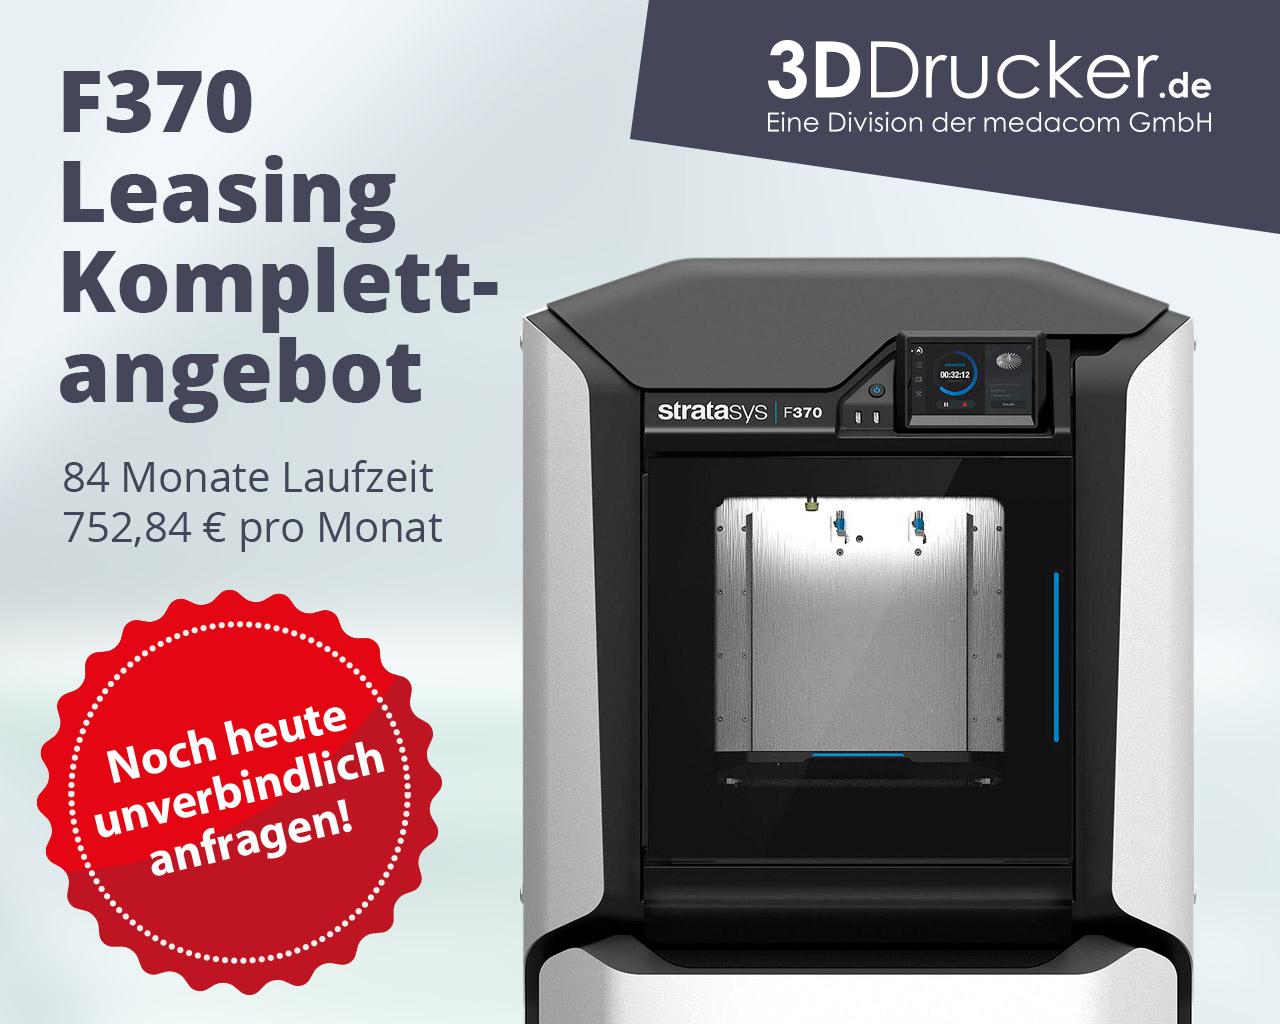 3D Druck Angebot | F370 Leasing Komplettangebot